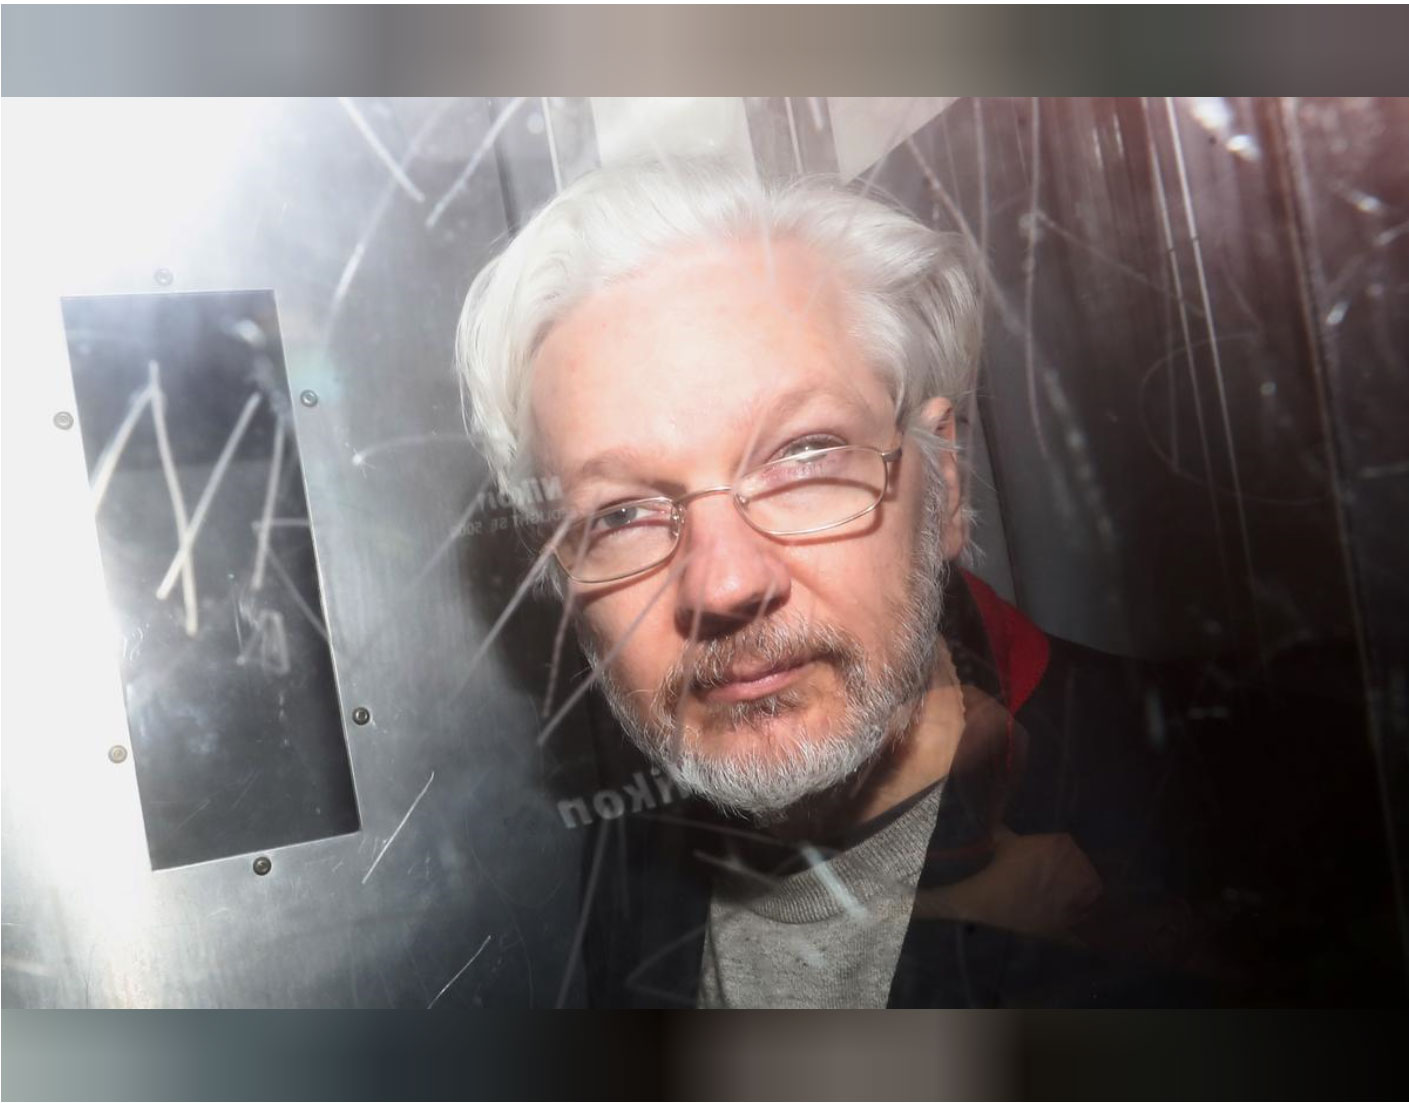 assange-denied-bail